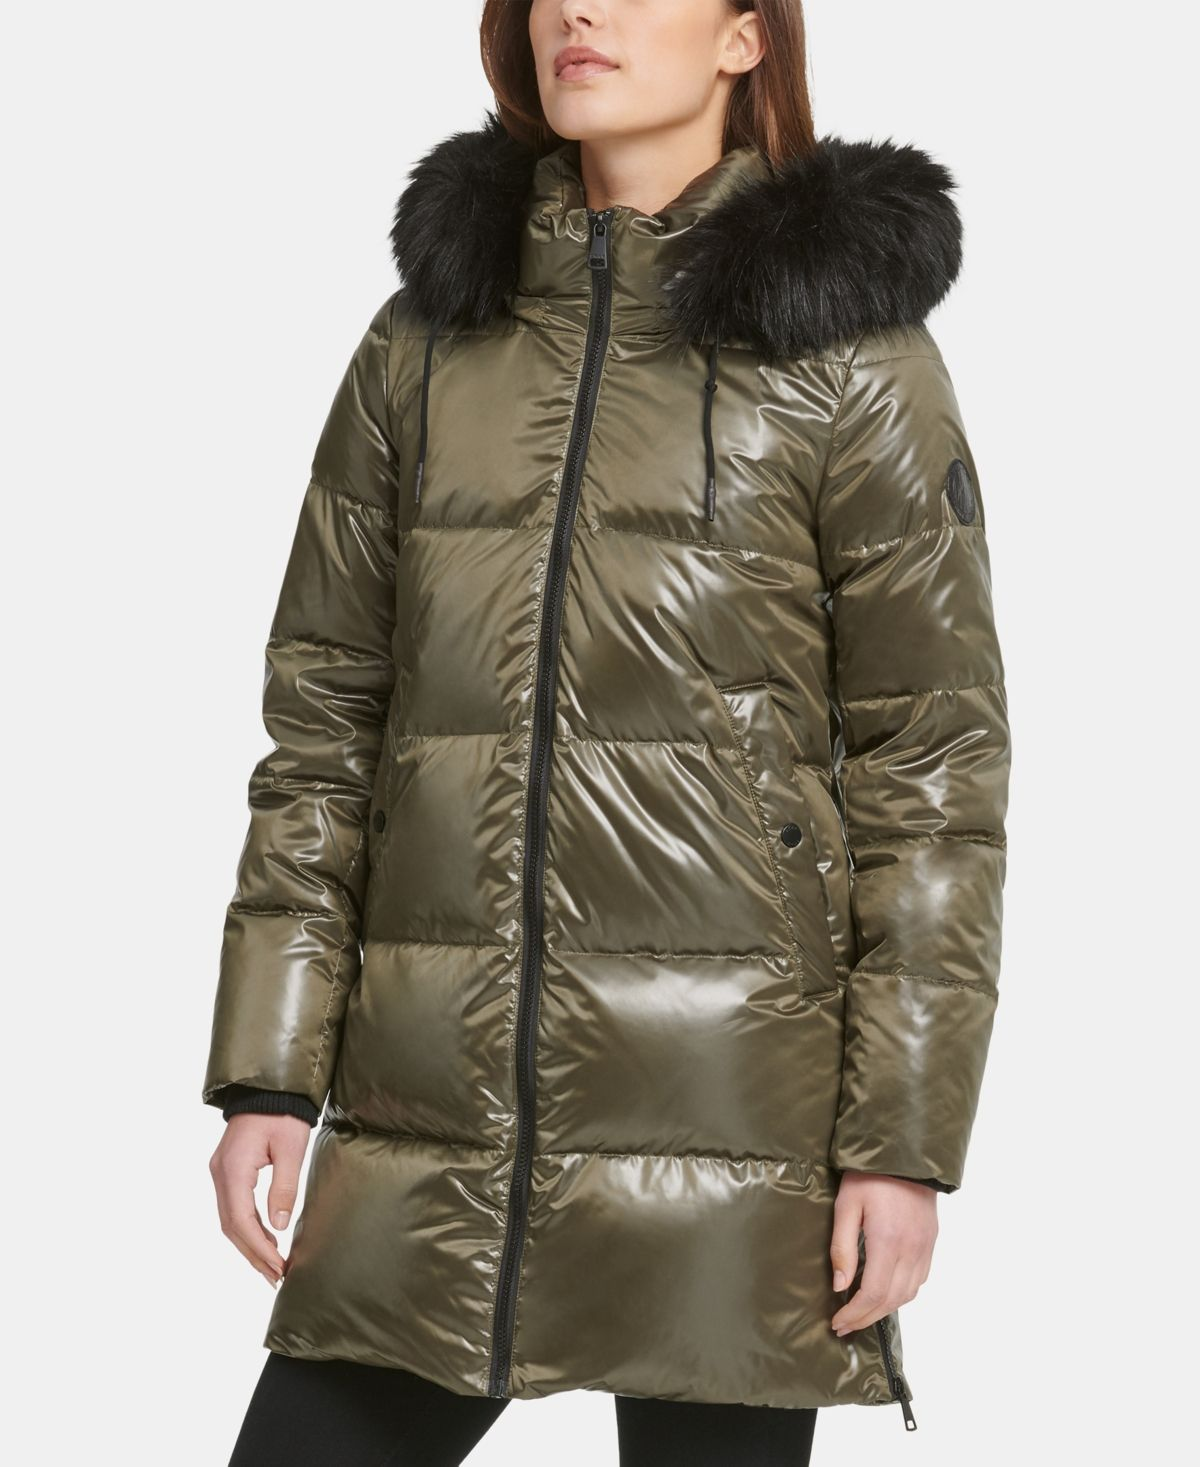 Dkny HighShine FauxFurTrim Hooded Puffer Coat Loden